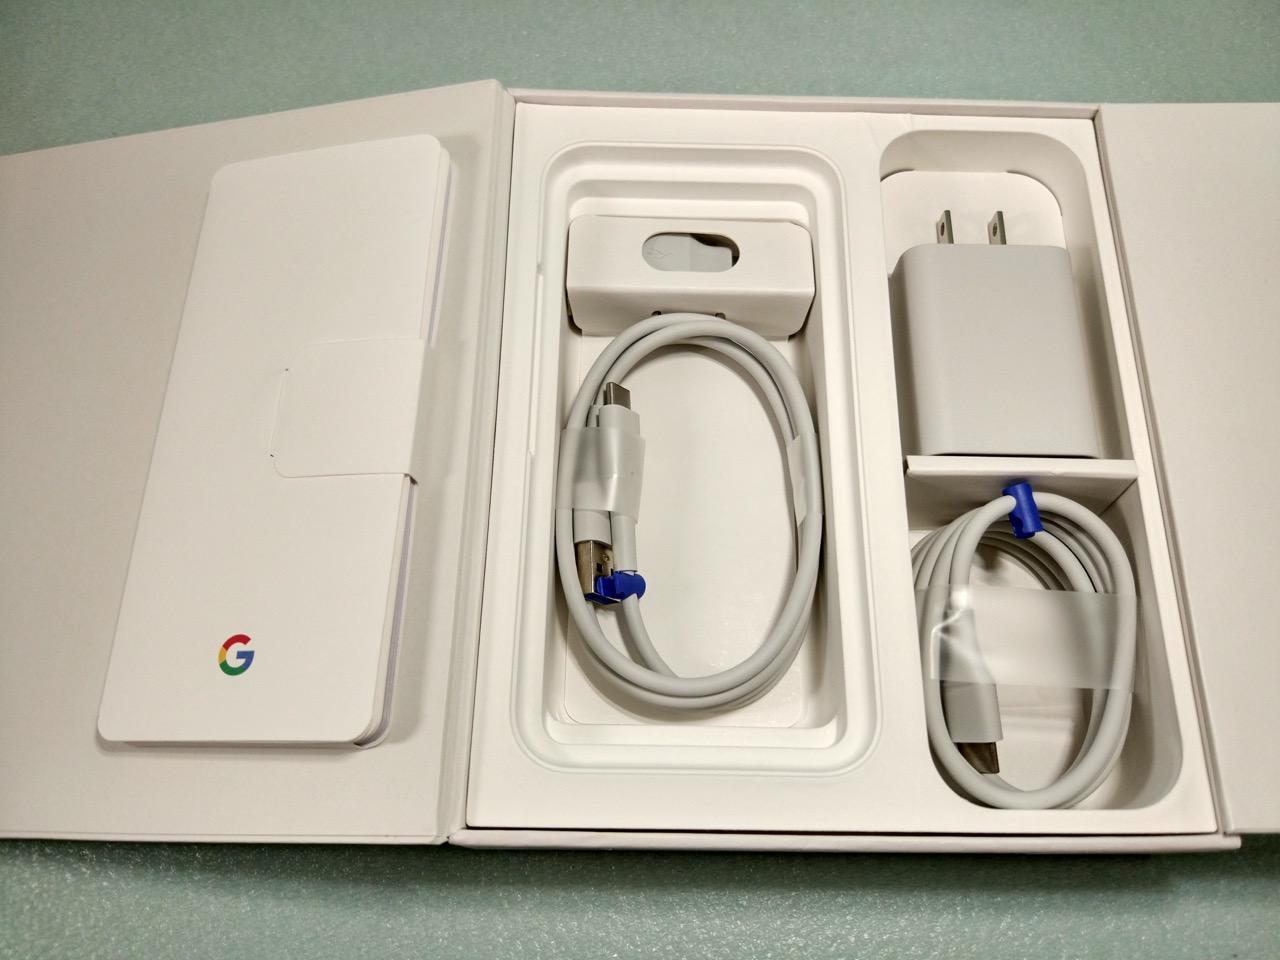 google-pixel-review-unboxed-accessories